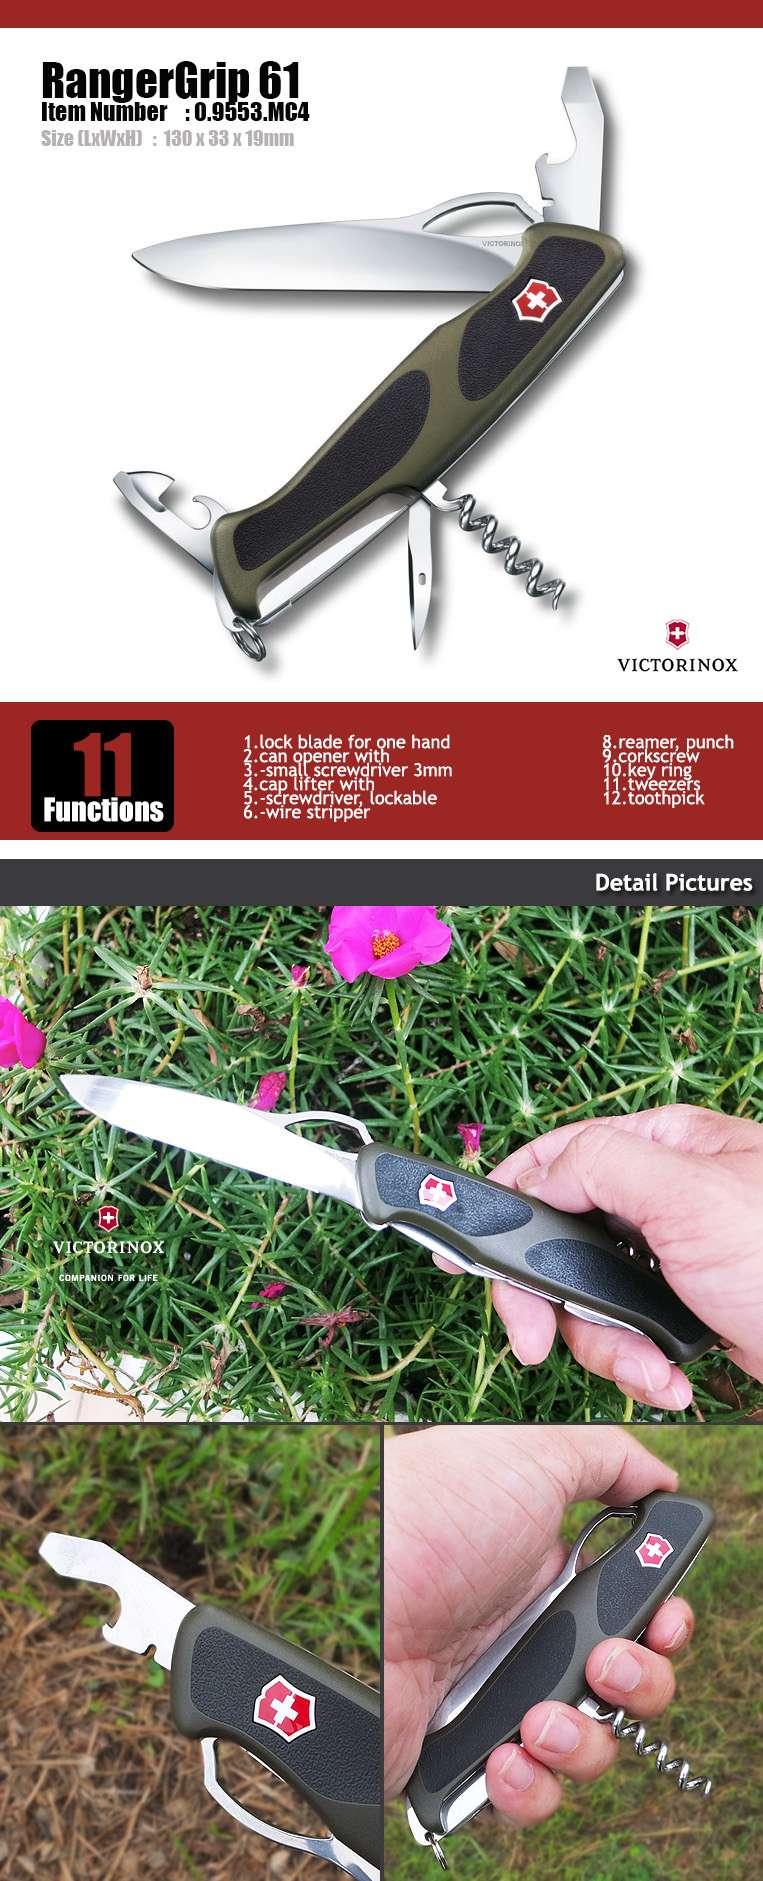 Victorinox Swiss Army Knife 130mm Rangergrip 61 Green